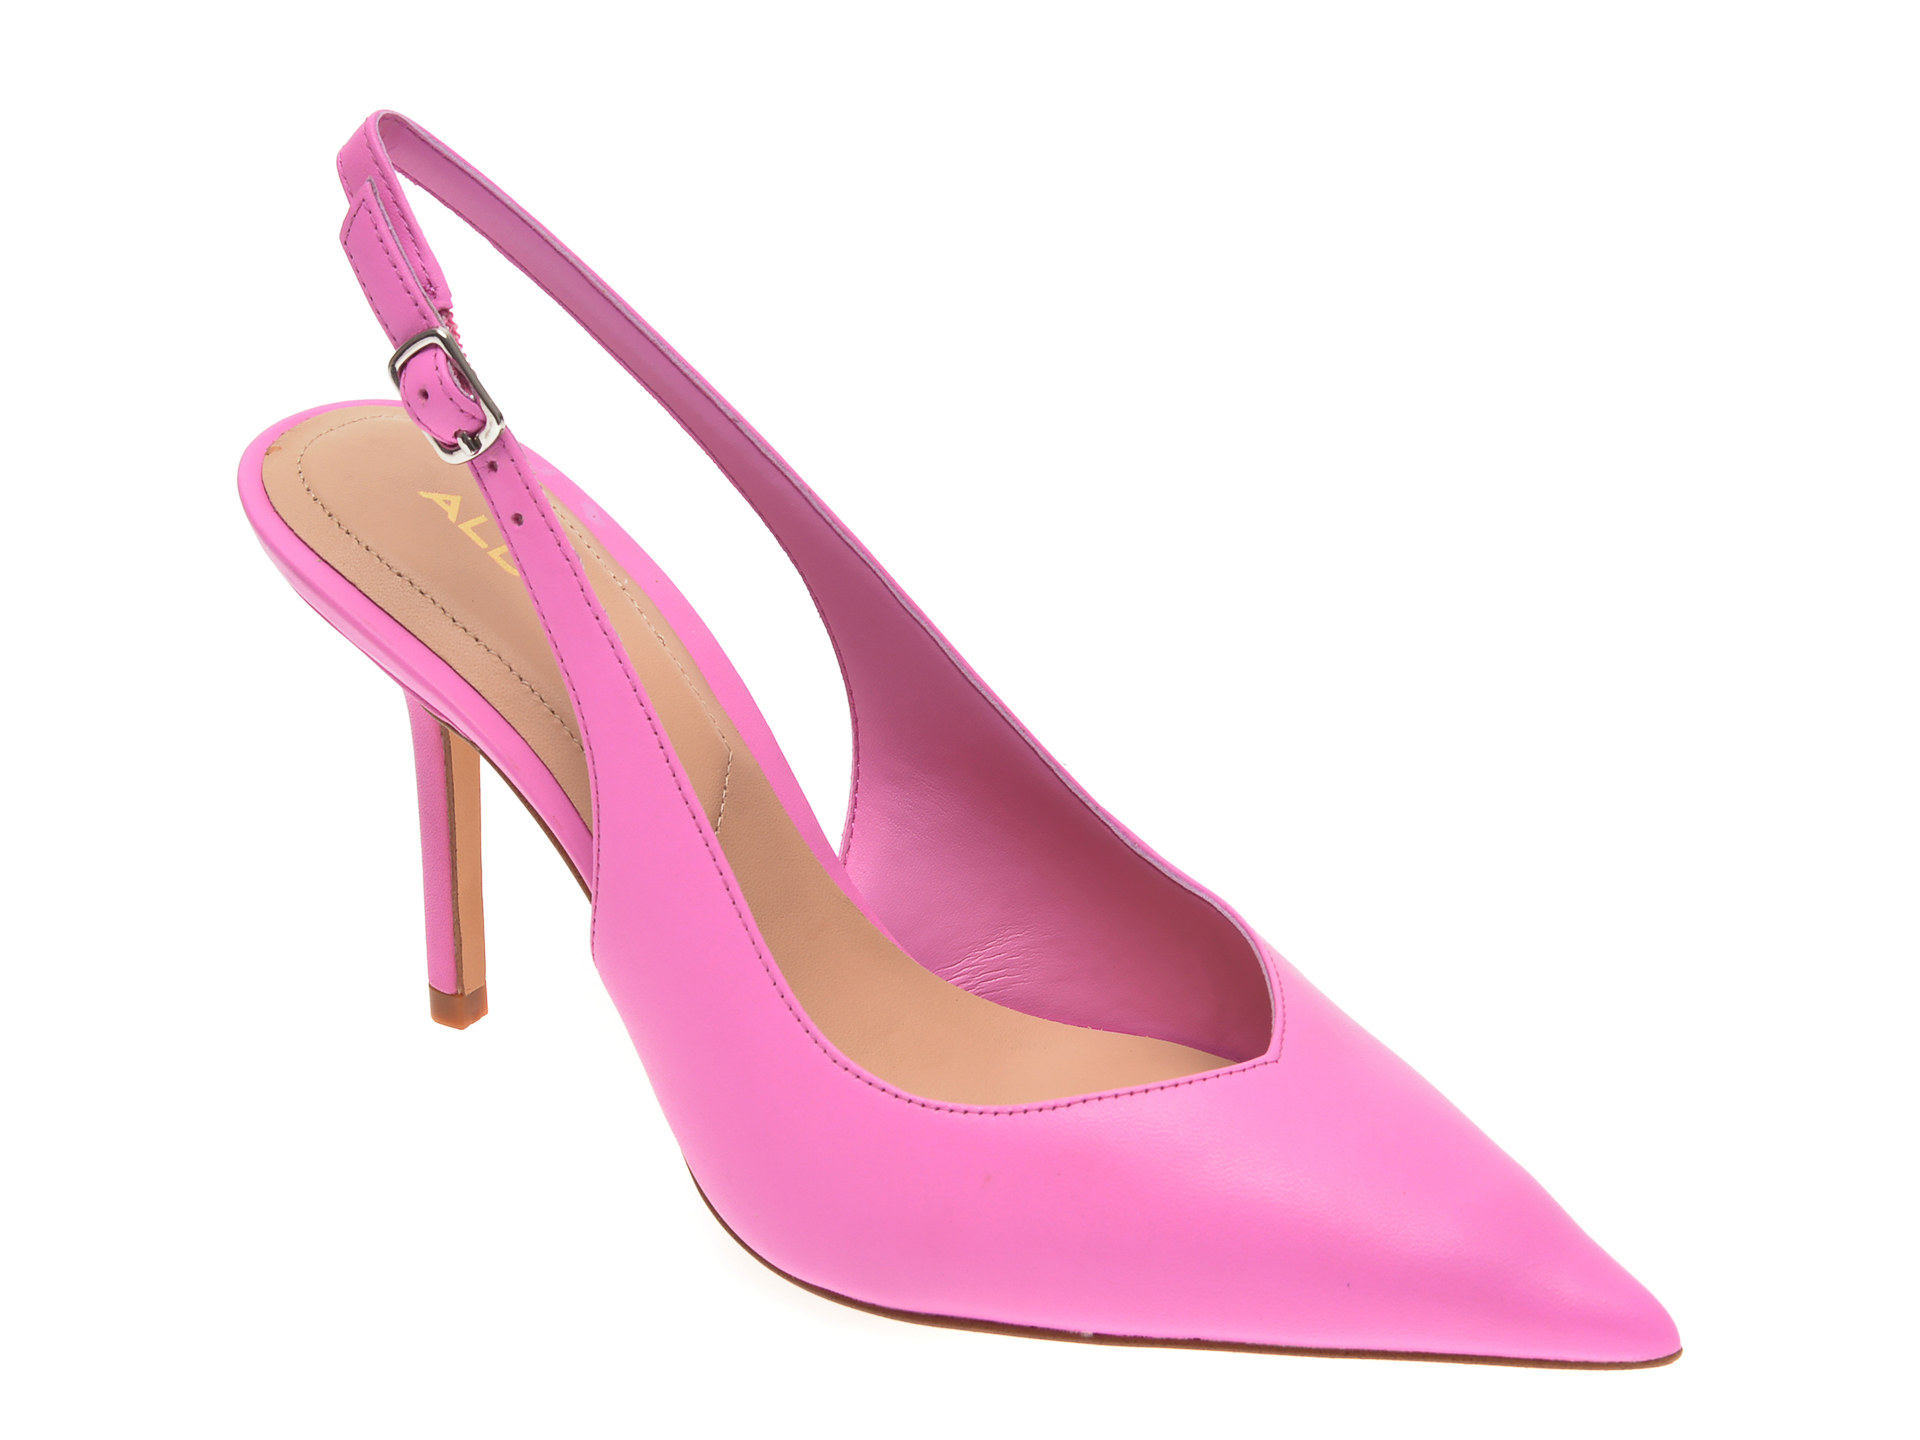 Pantofi ALDO roz, Julietta680, din piele naturala